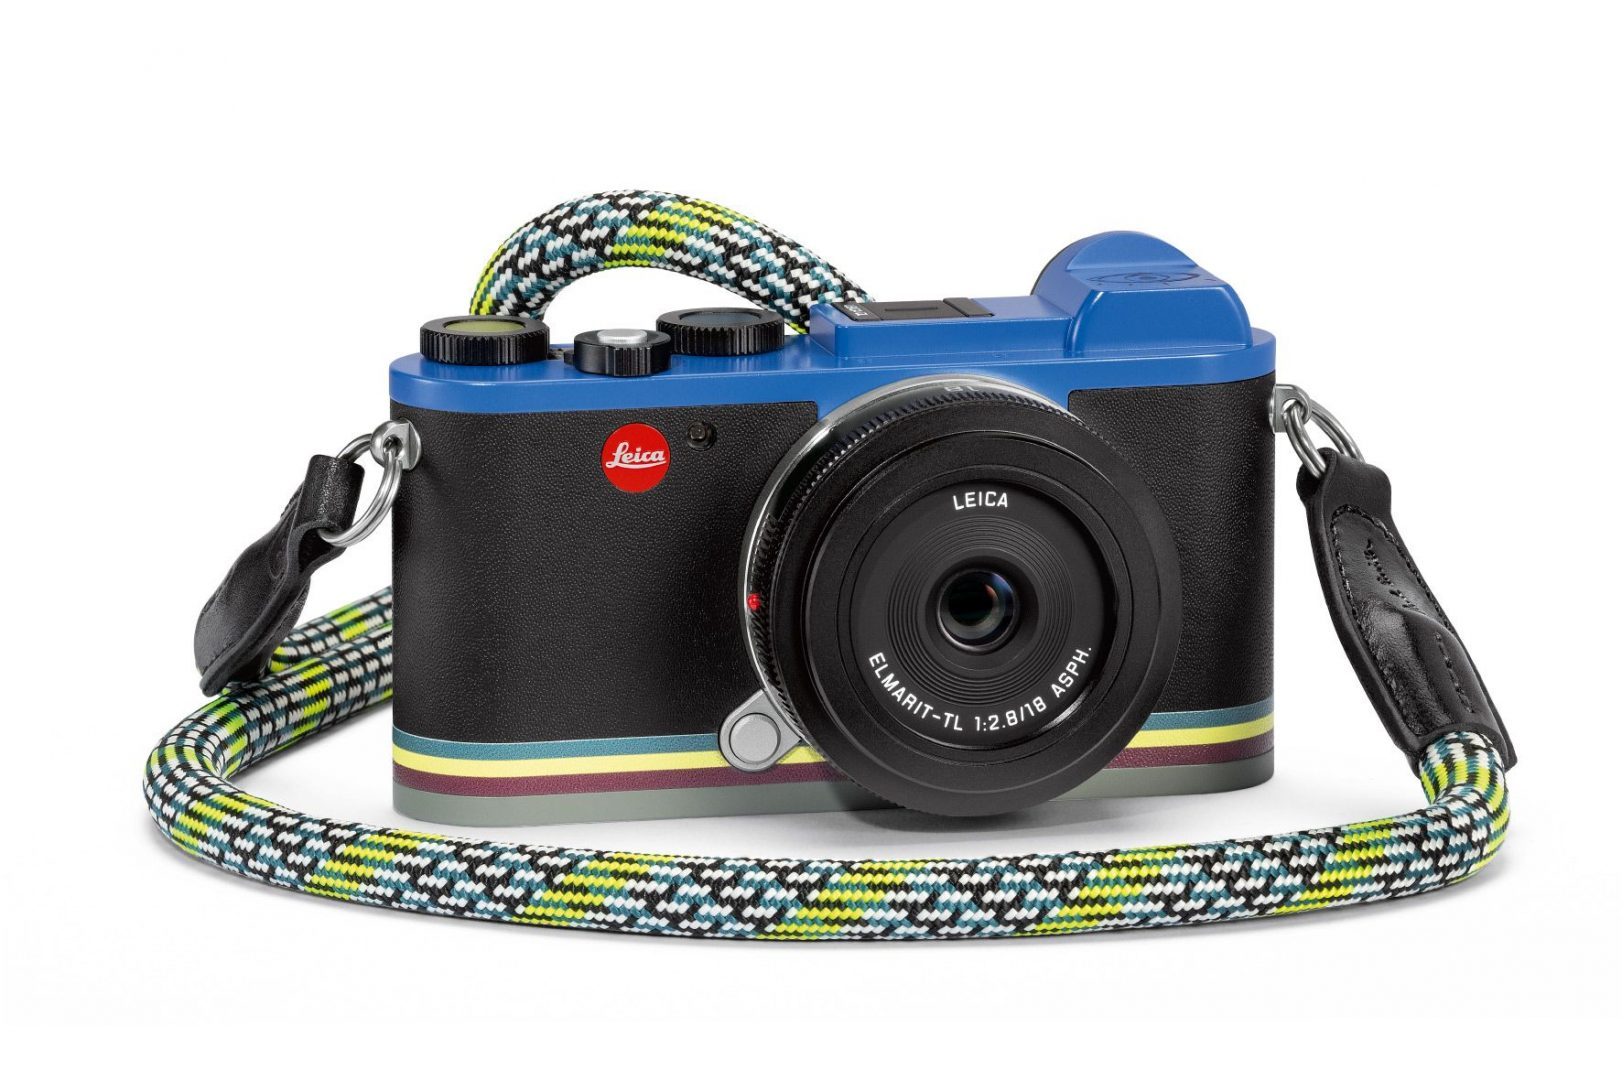 Leica-pall-smith